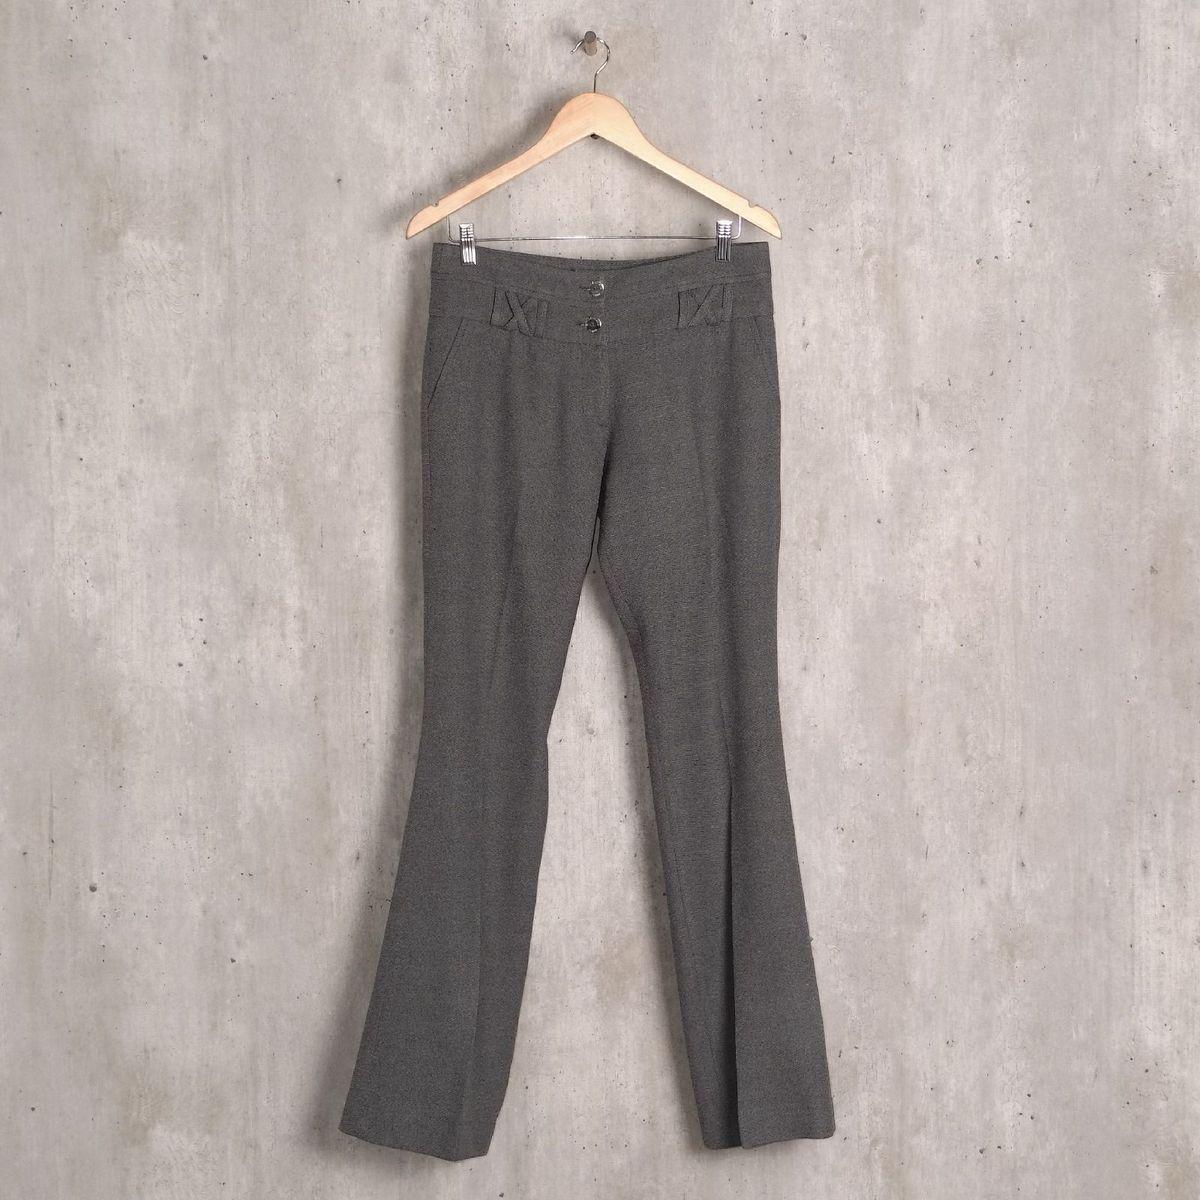 calça cinza mesclada brooksfield - calças brooksfield